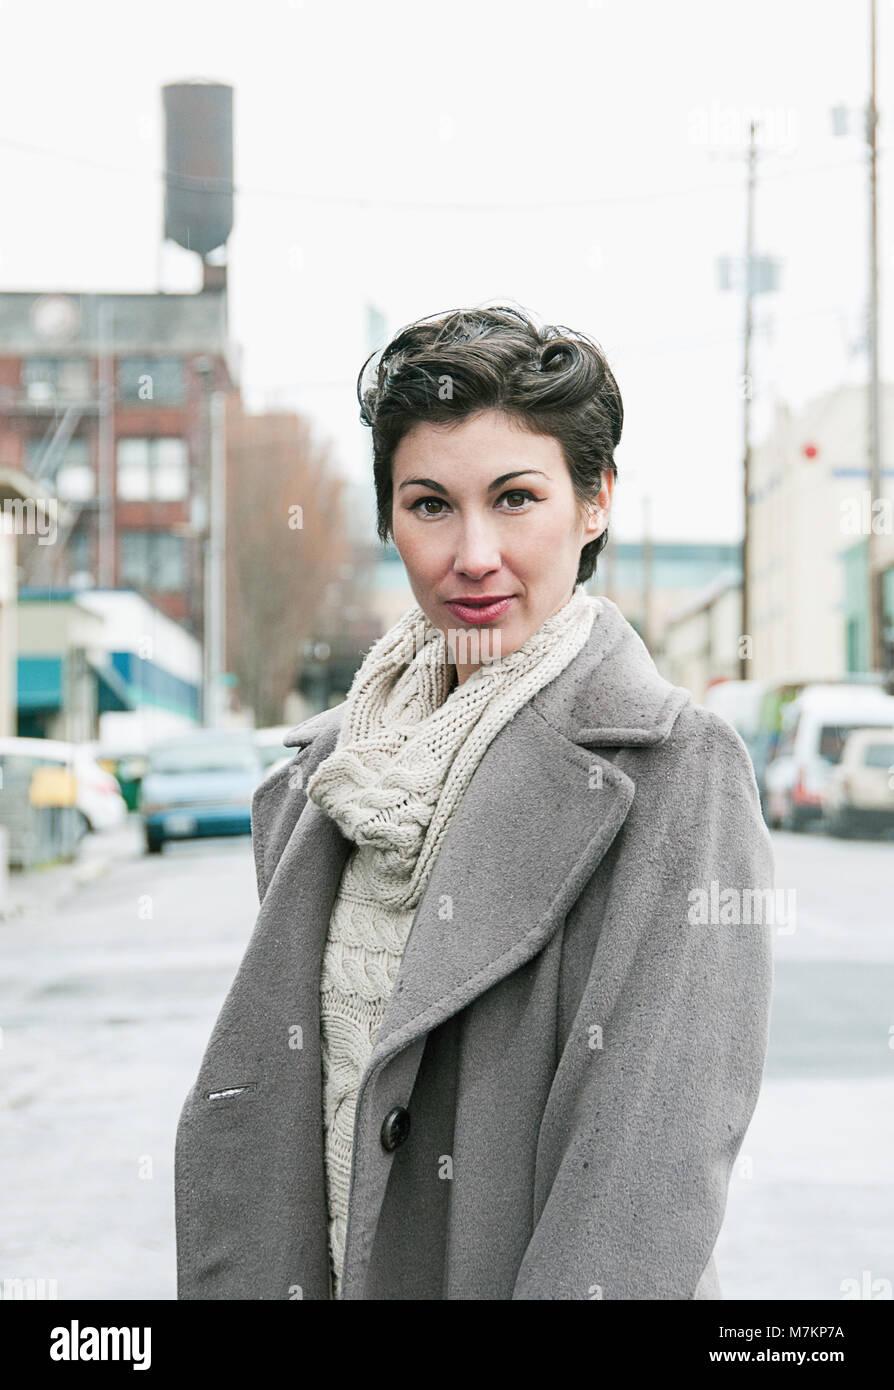 A portrait of a woman in Portland, Oregon. - Stock Image